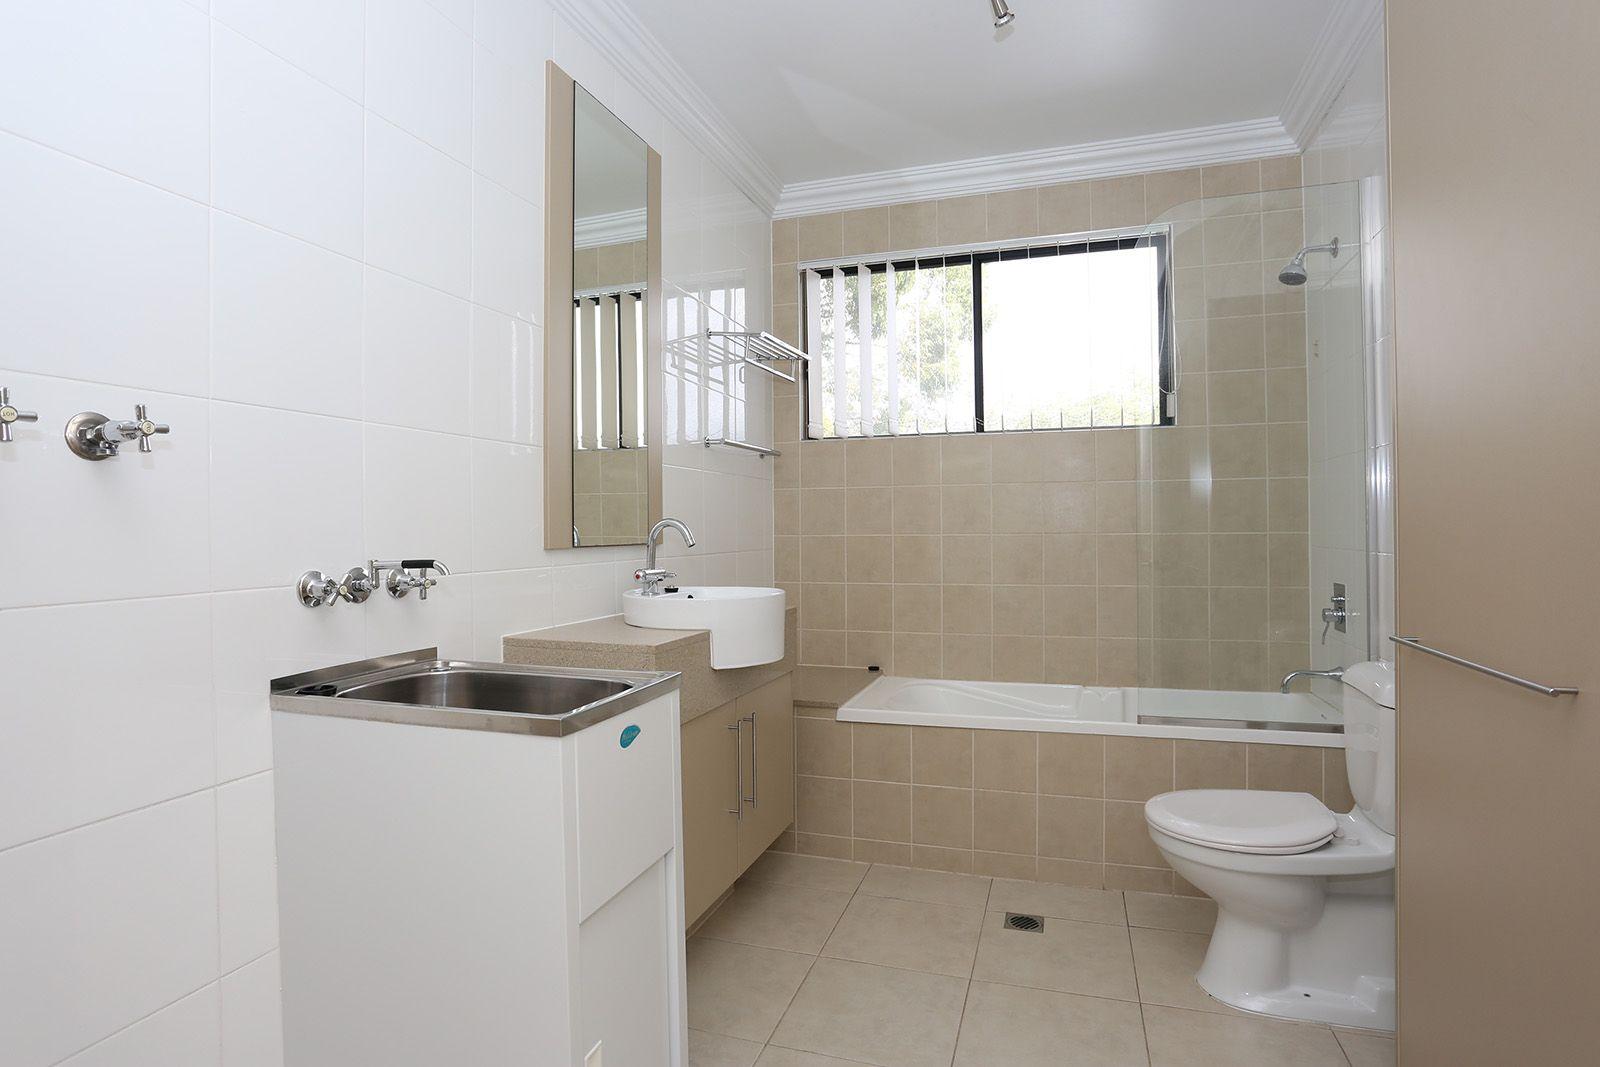 5/33 Station Ave, Gaythorne QLD 4051, Image 2